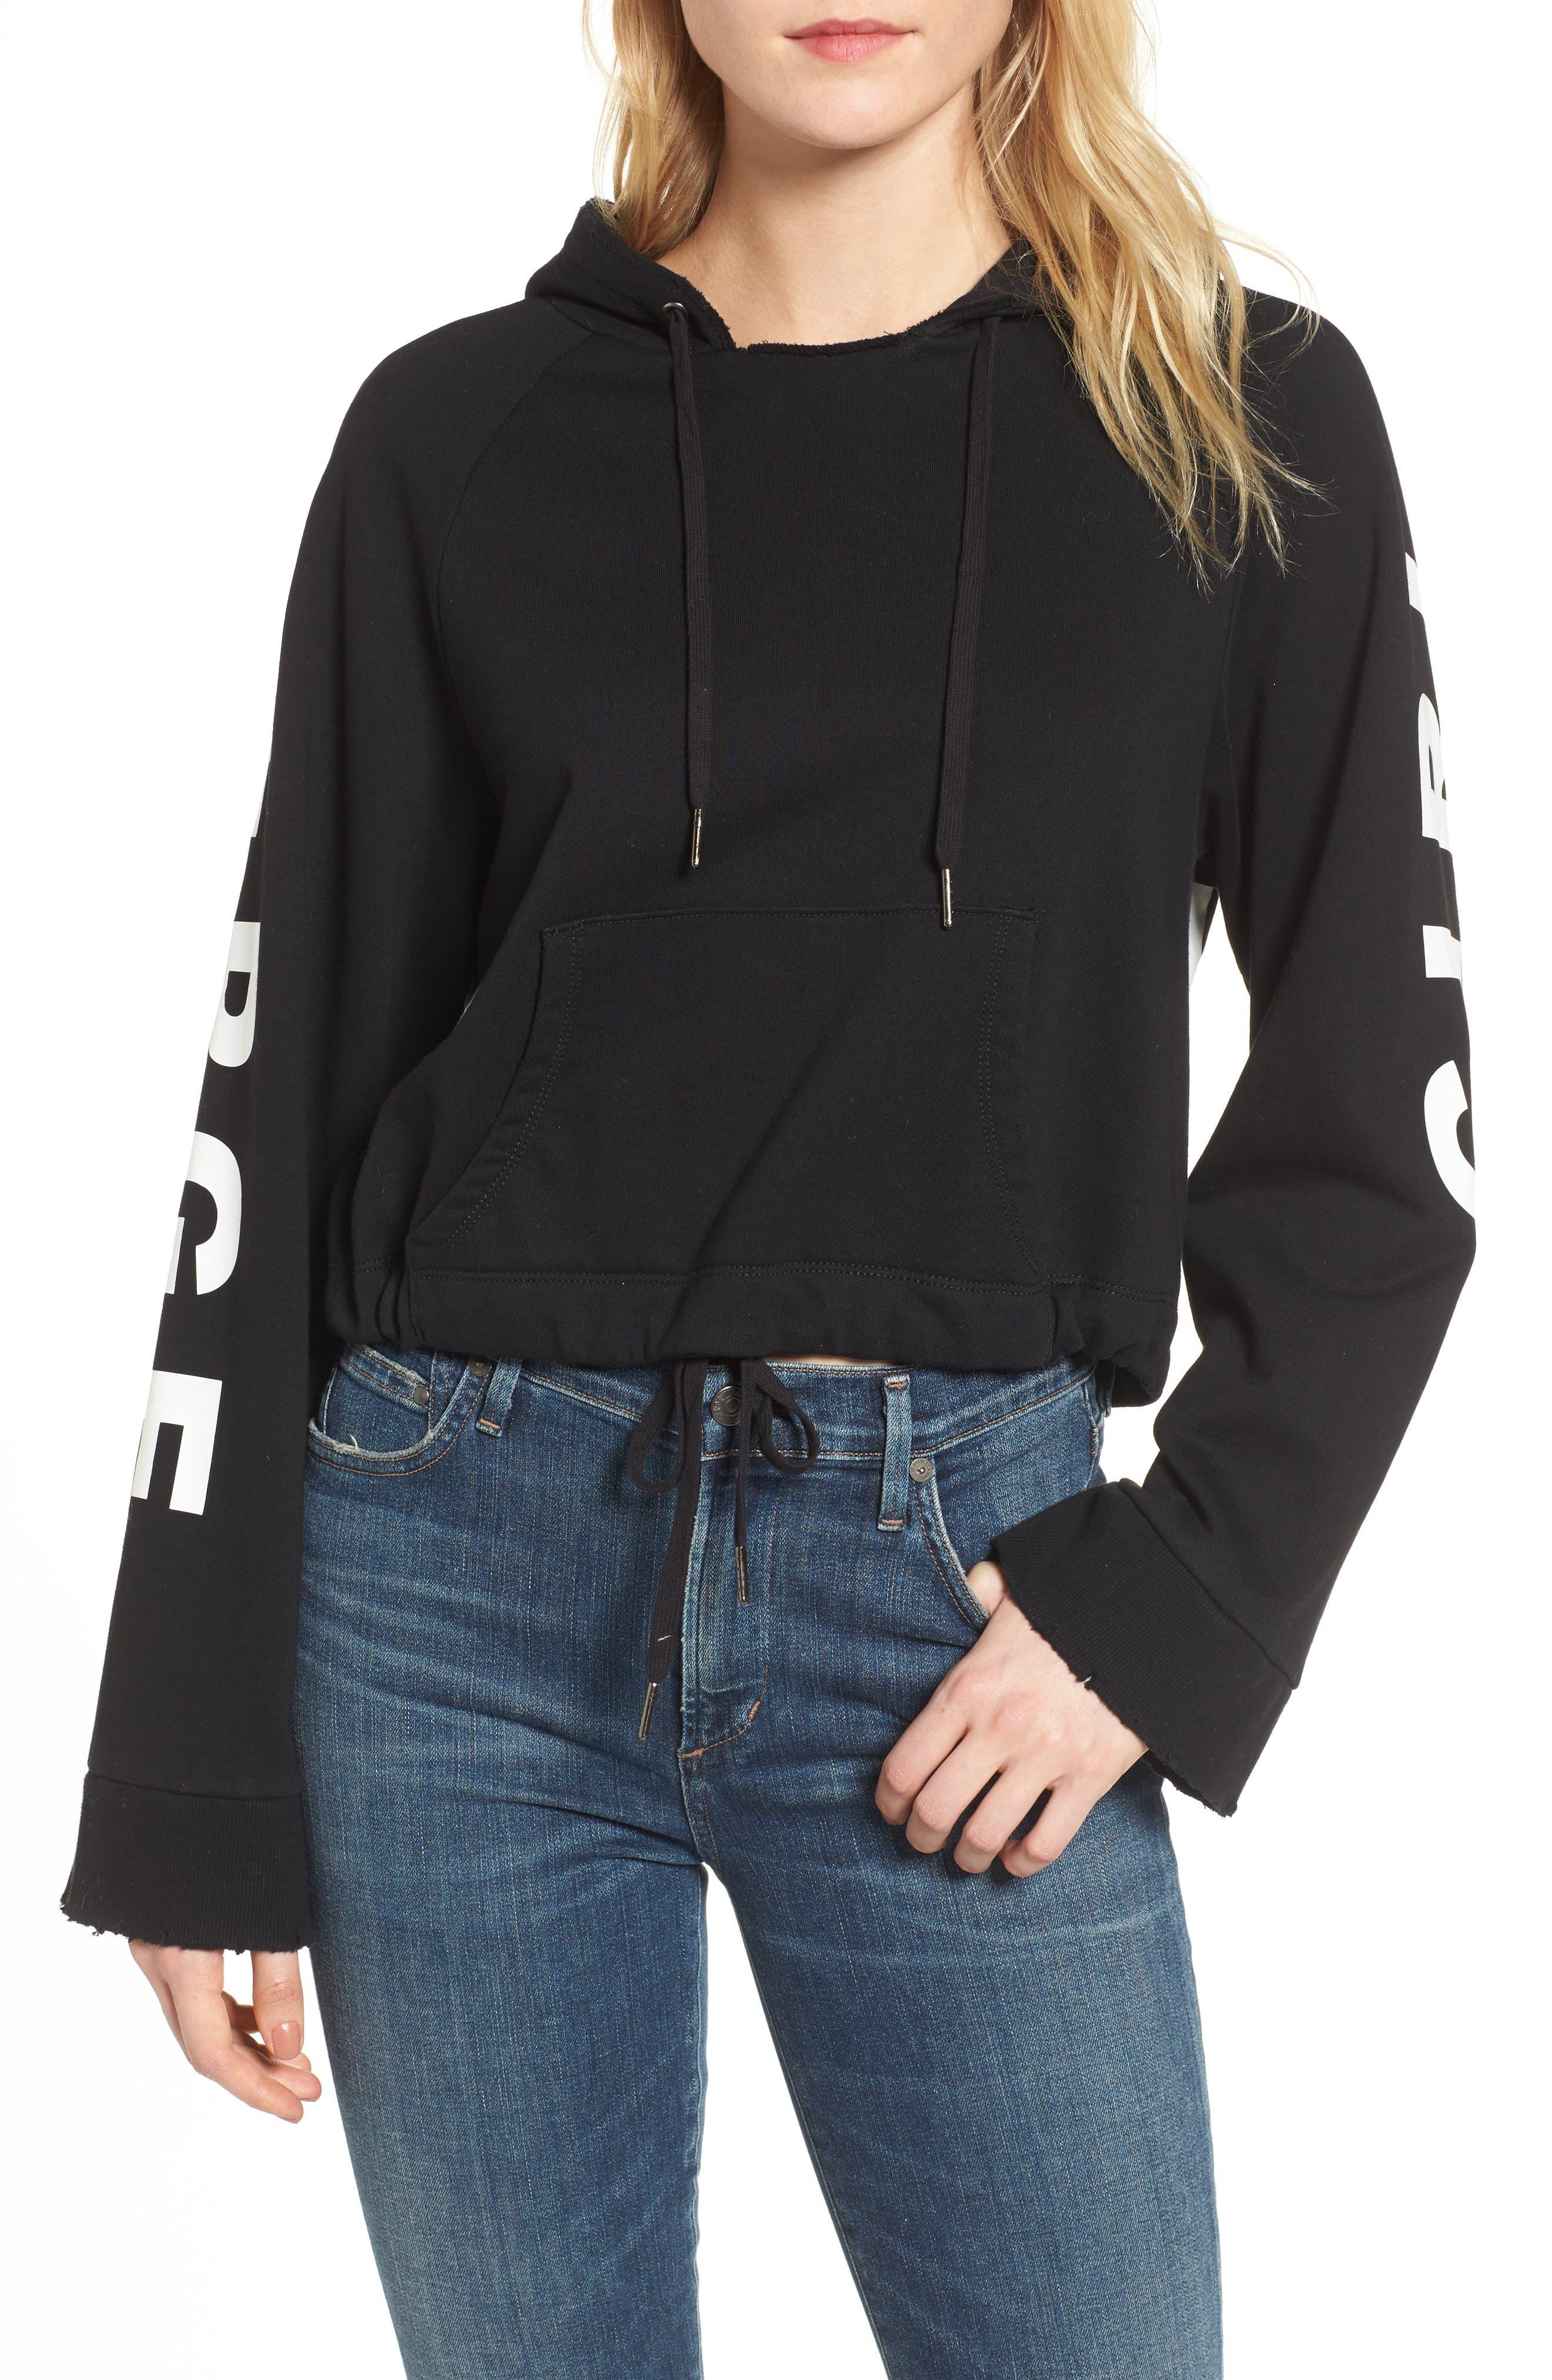 Girl on the Verge Crop Sweatshirt,                         Main,                         color, 001